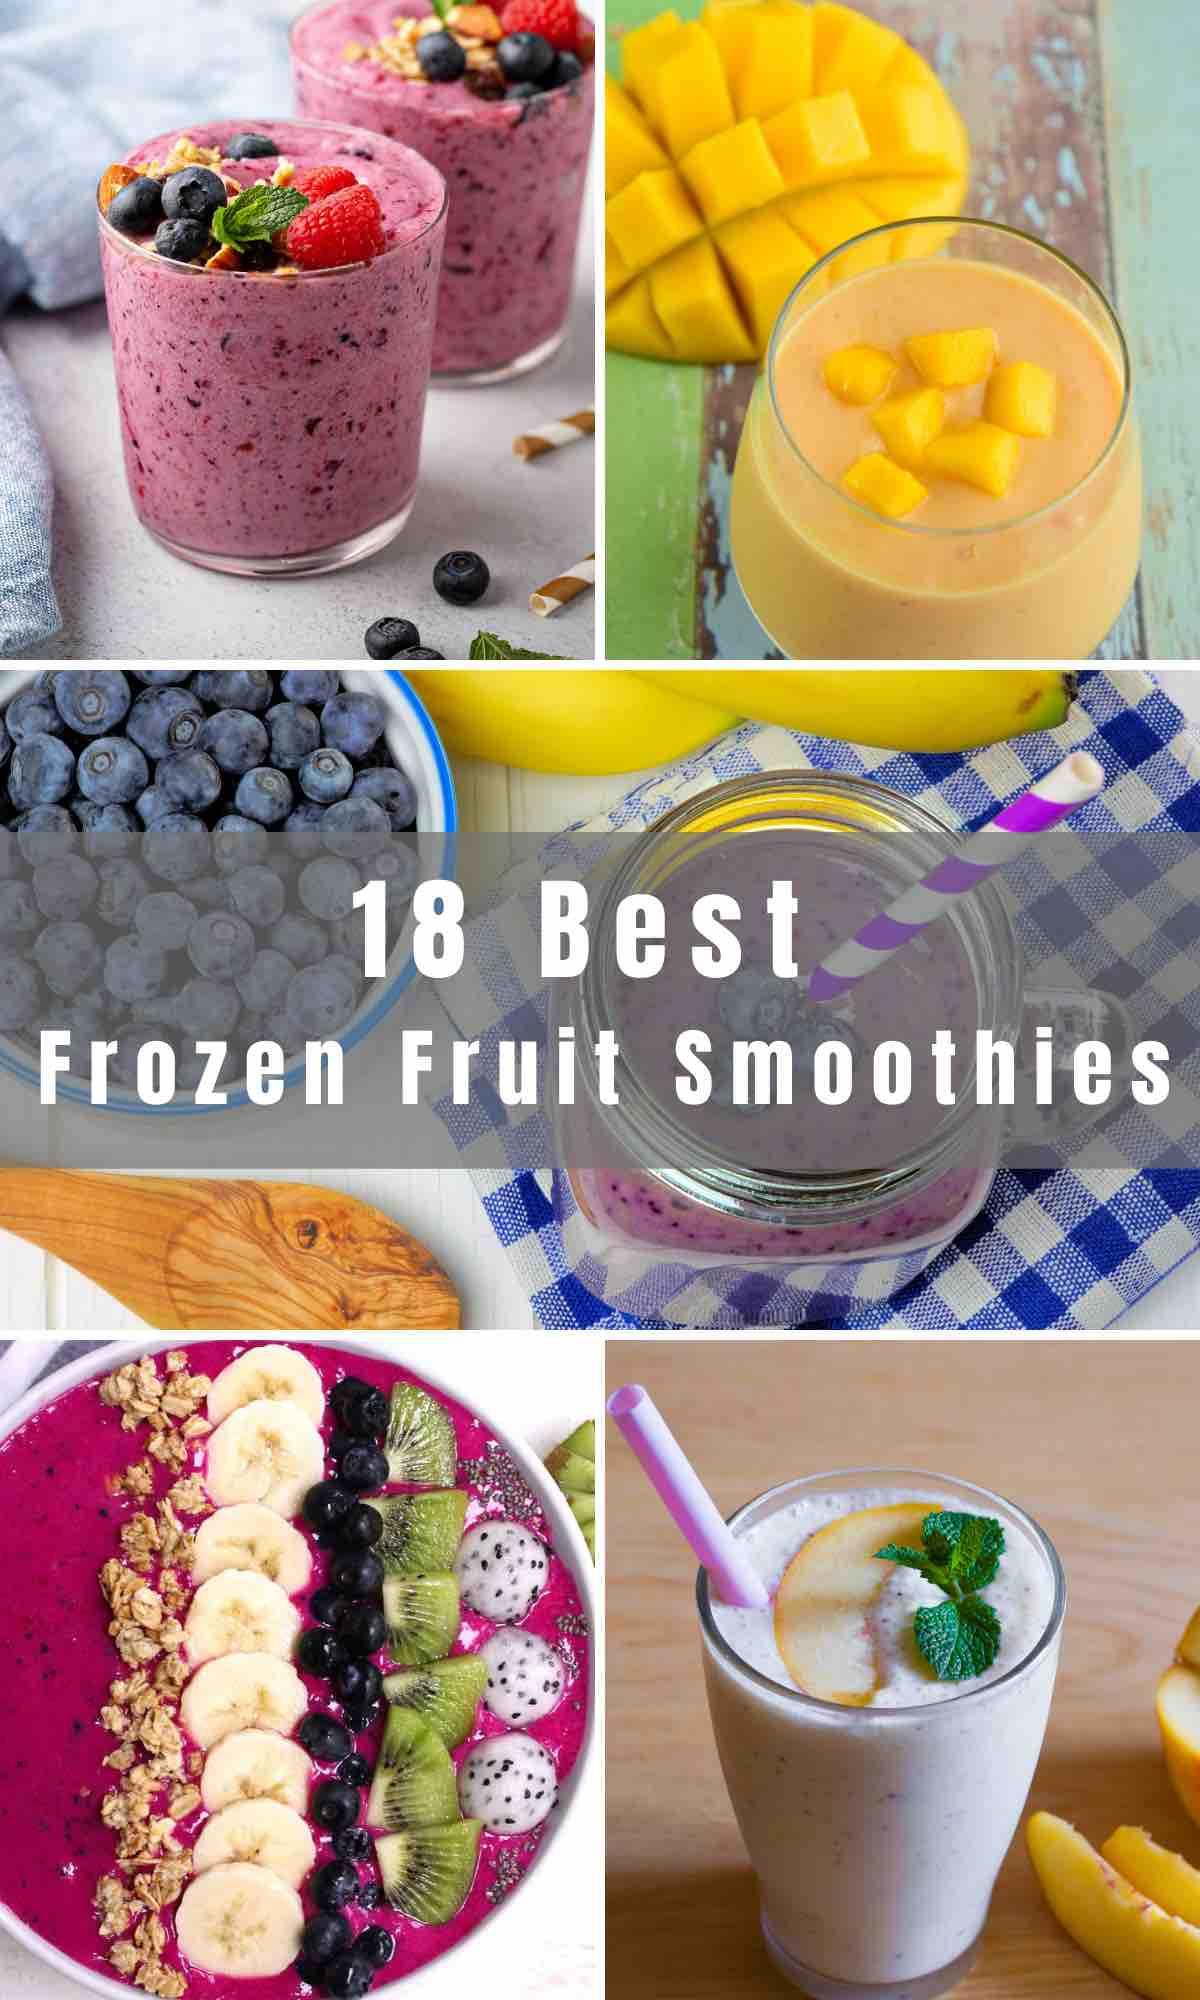 8 Easy Frozen Fruit Smoothie Recipes - IzzyCooking